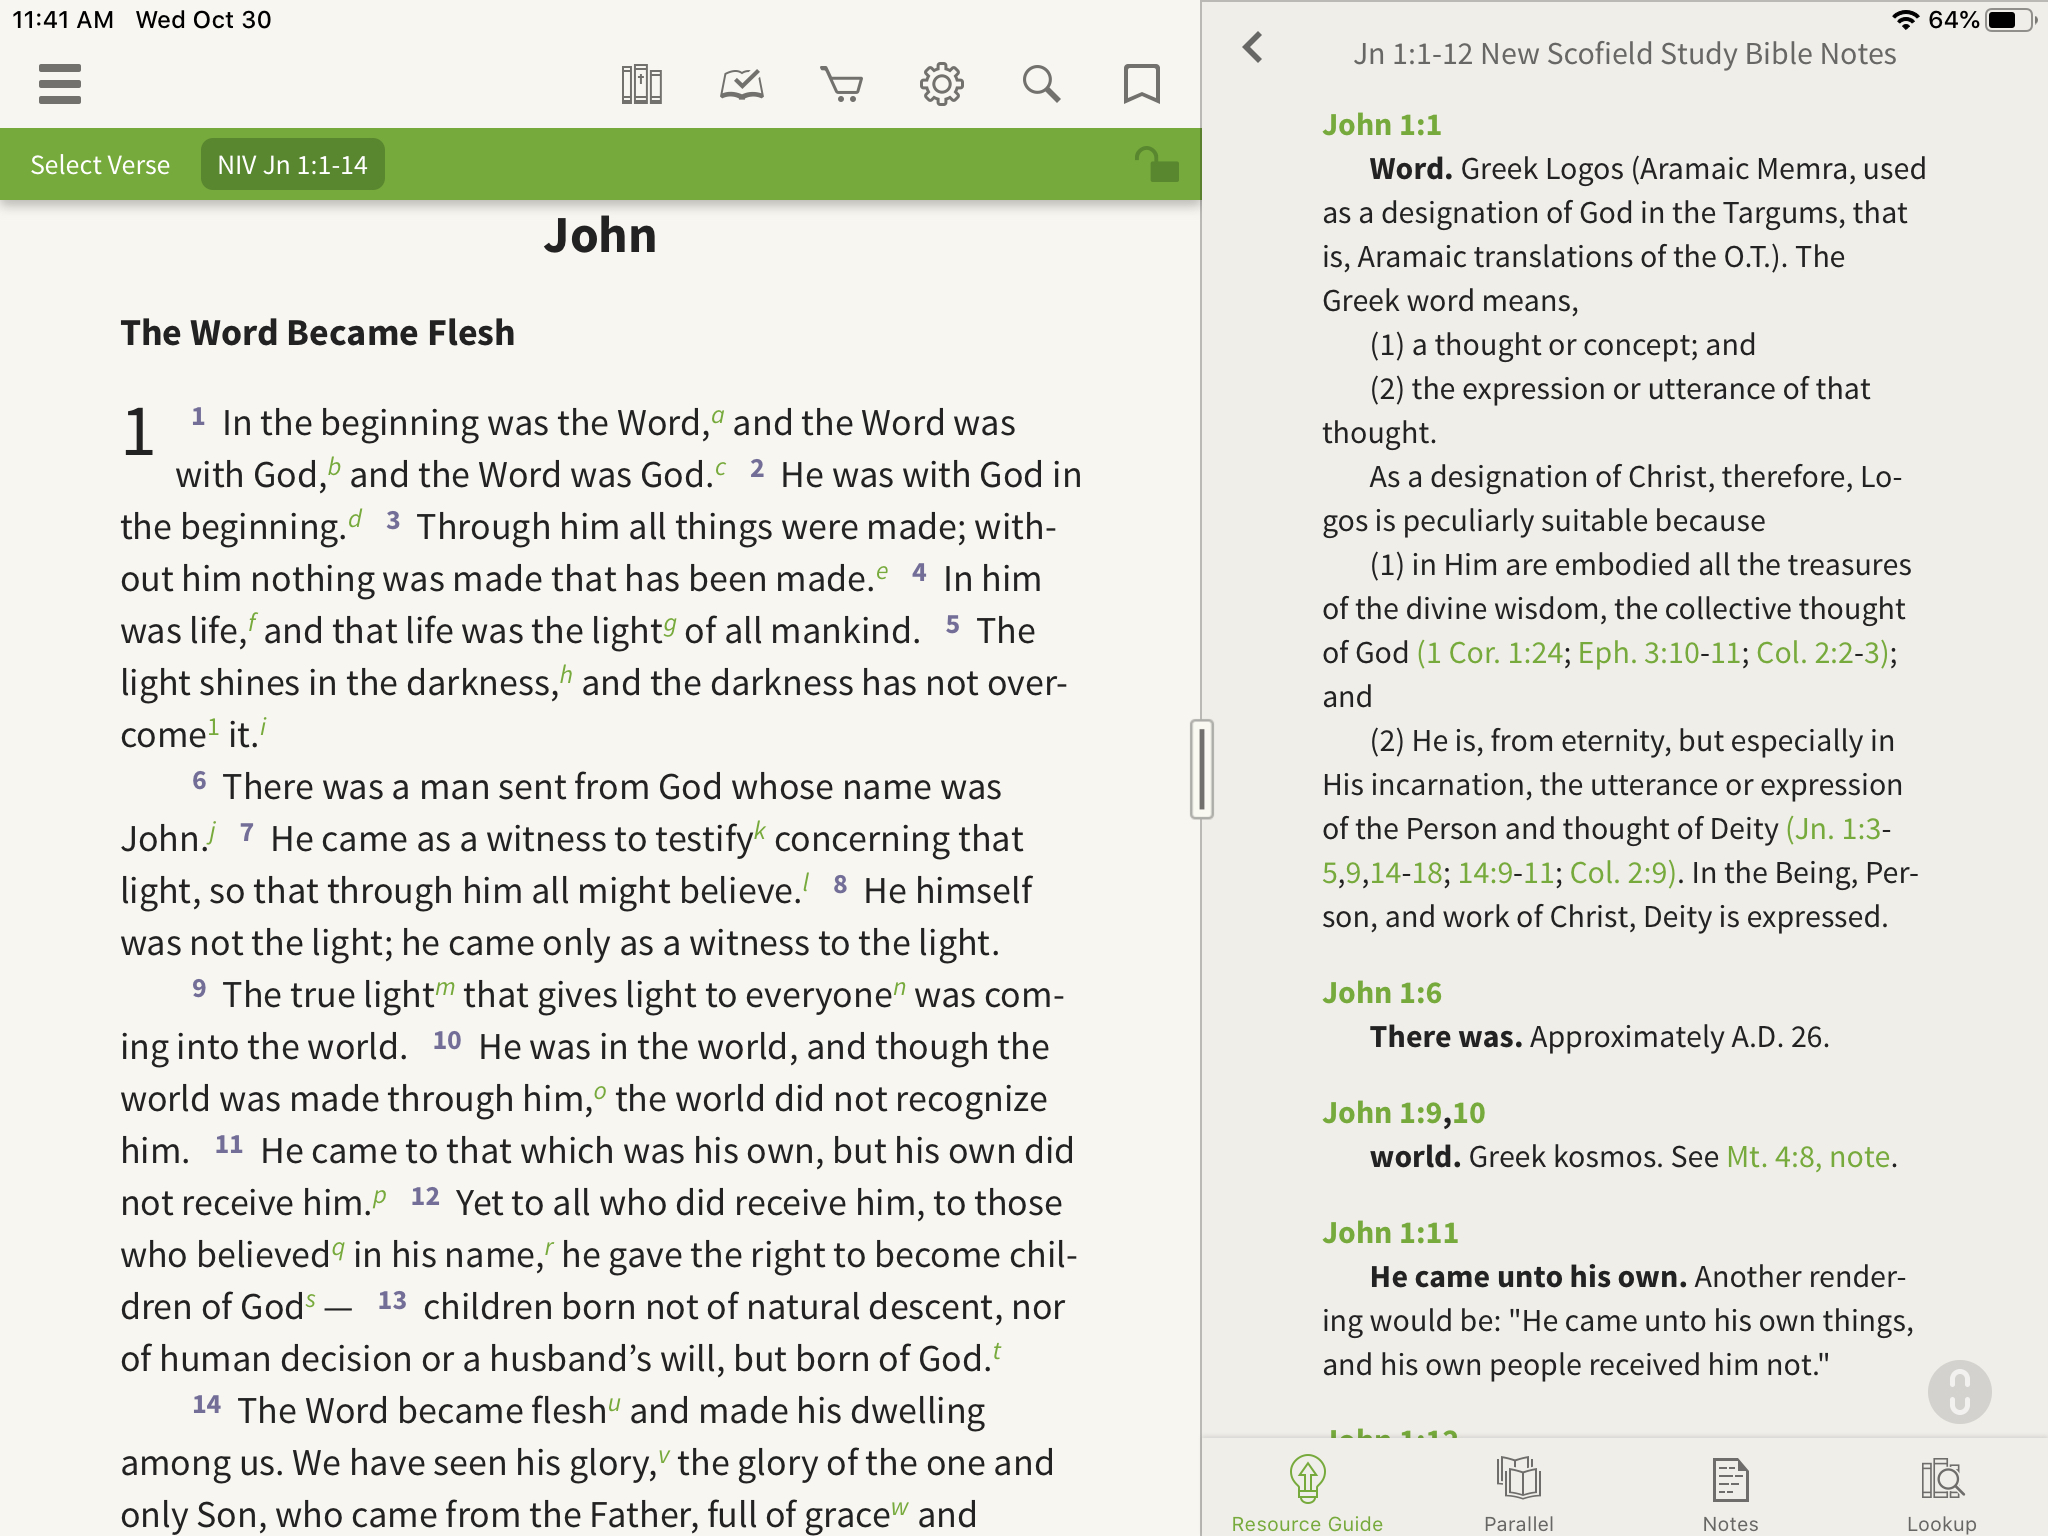 New Scofield Study Bible Notes split tab